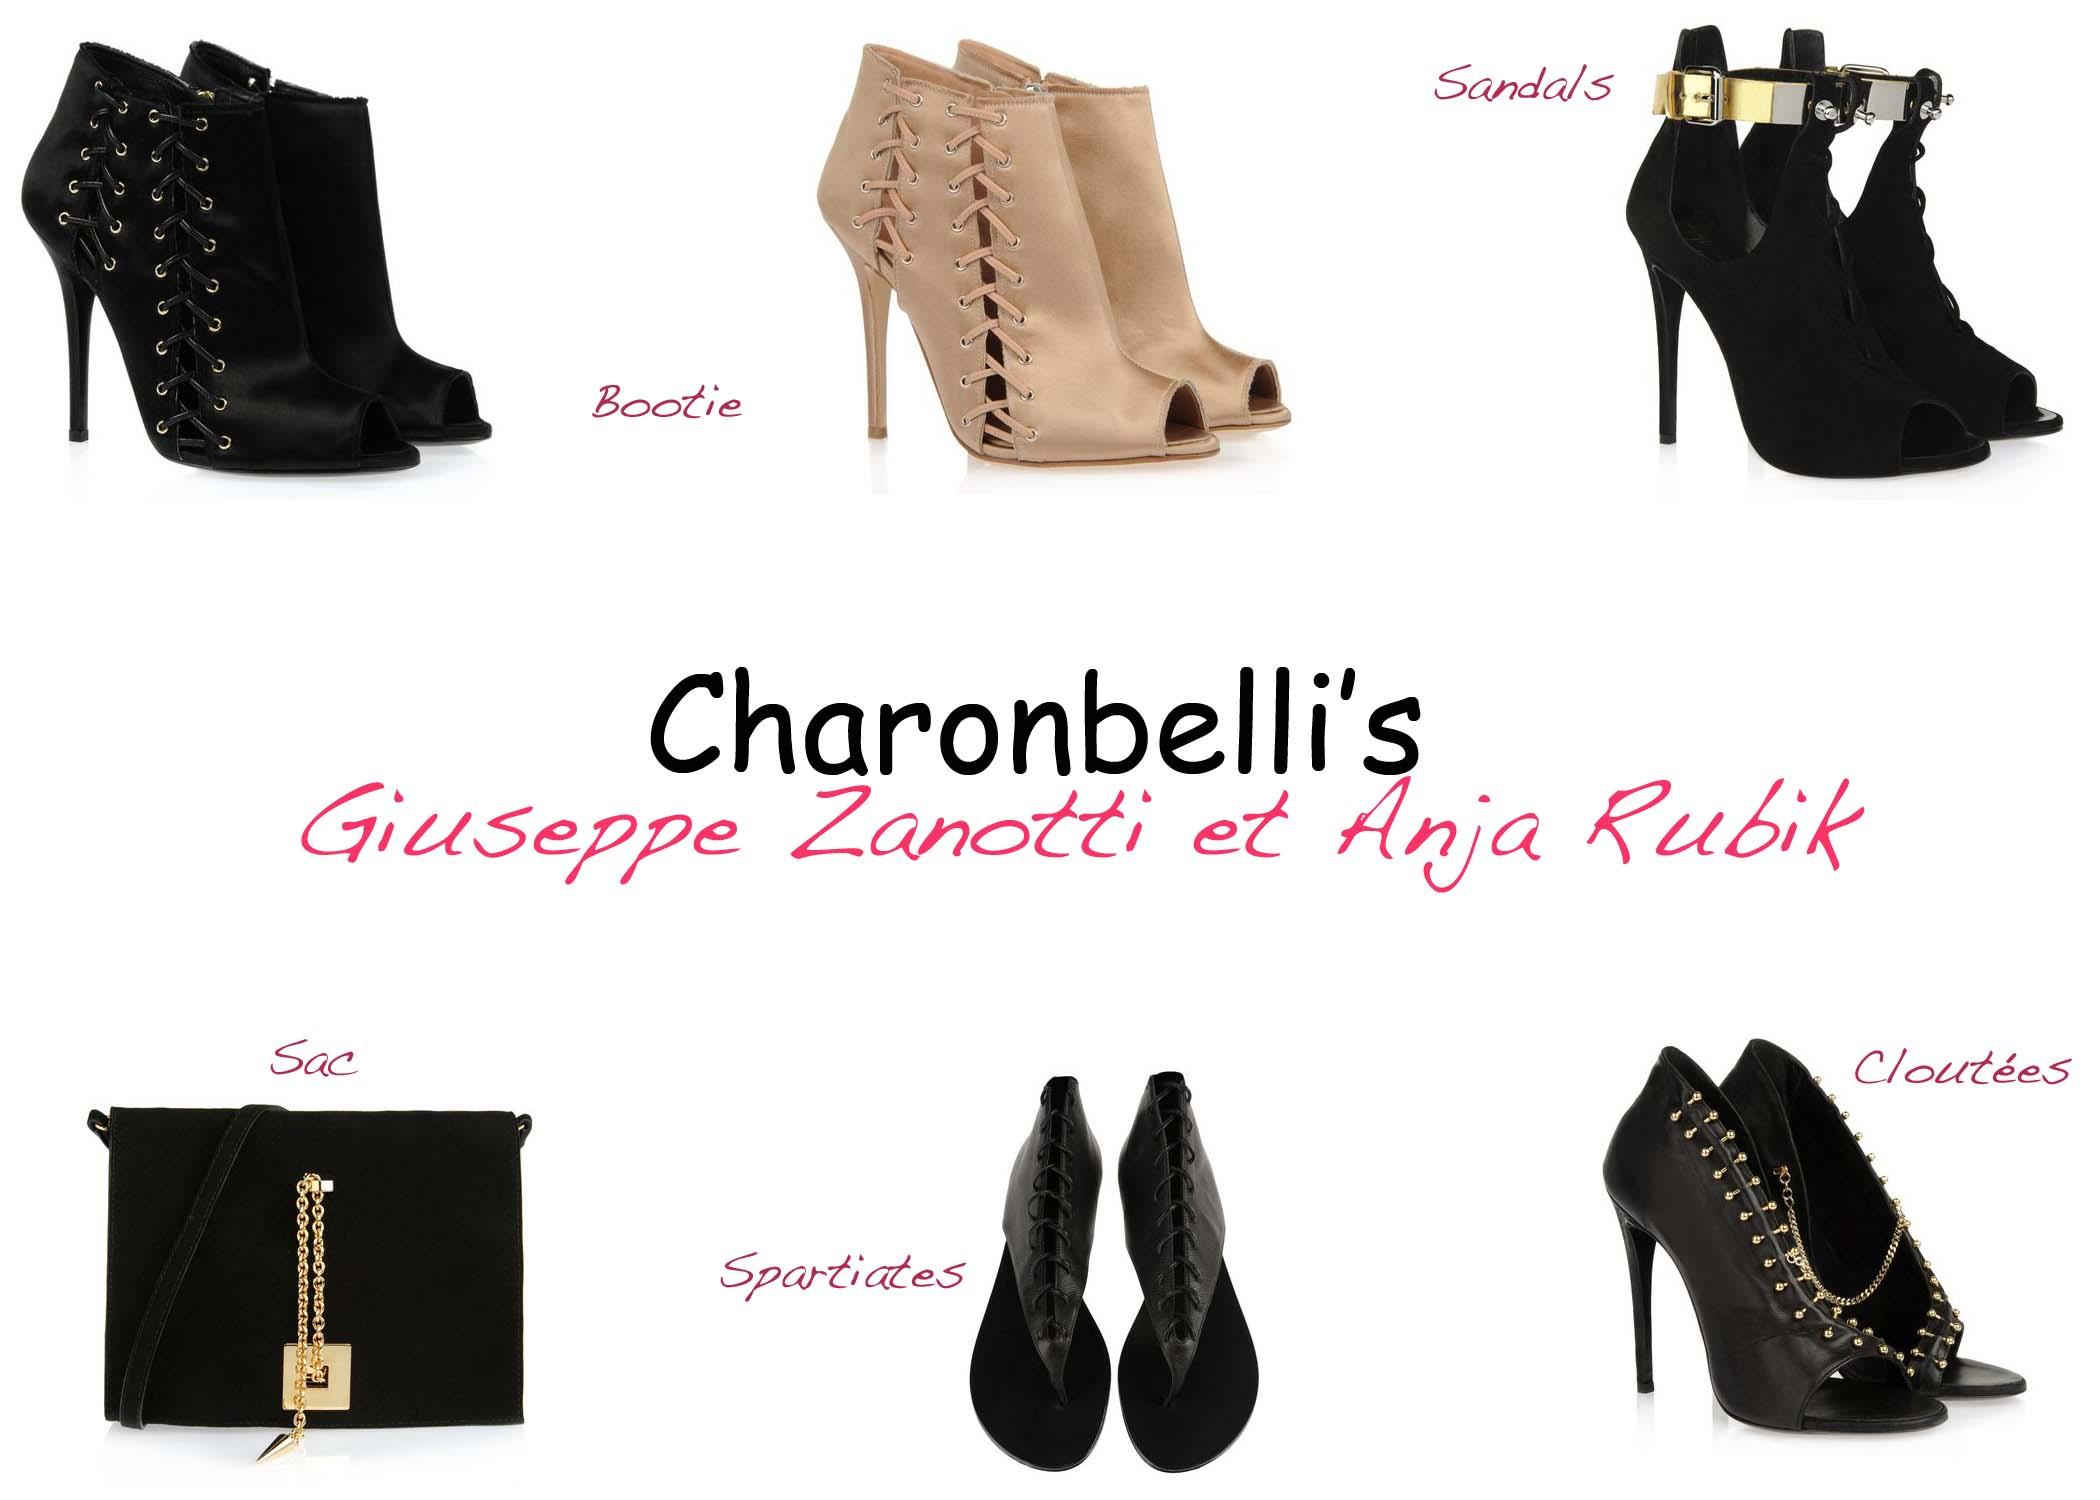 Charonbelli's, Giuseppe Zanotti, Anja Rubik - Charonbelli's blog mode